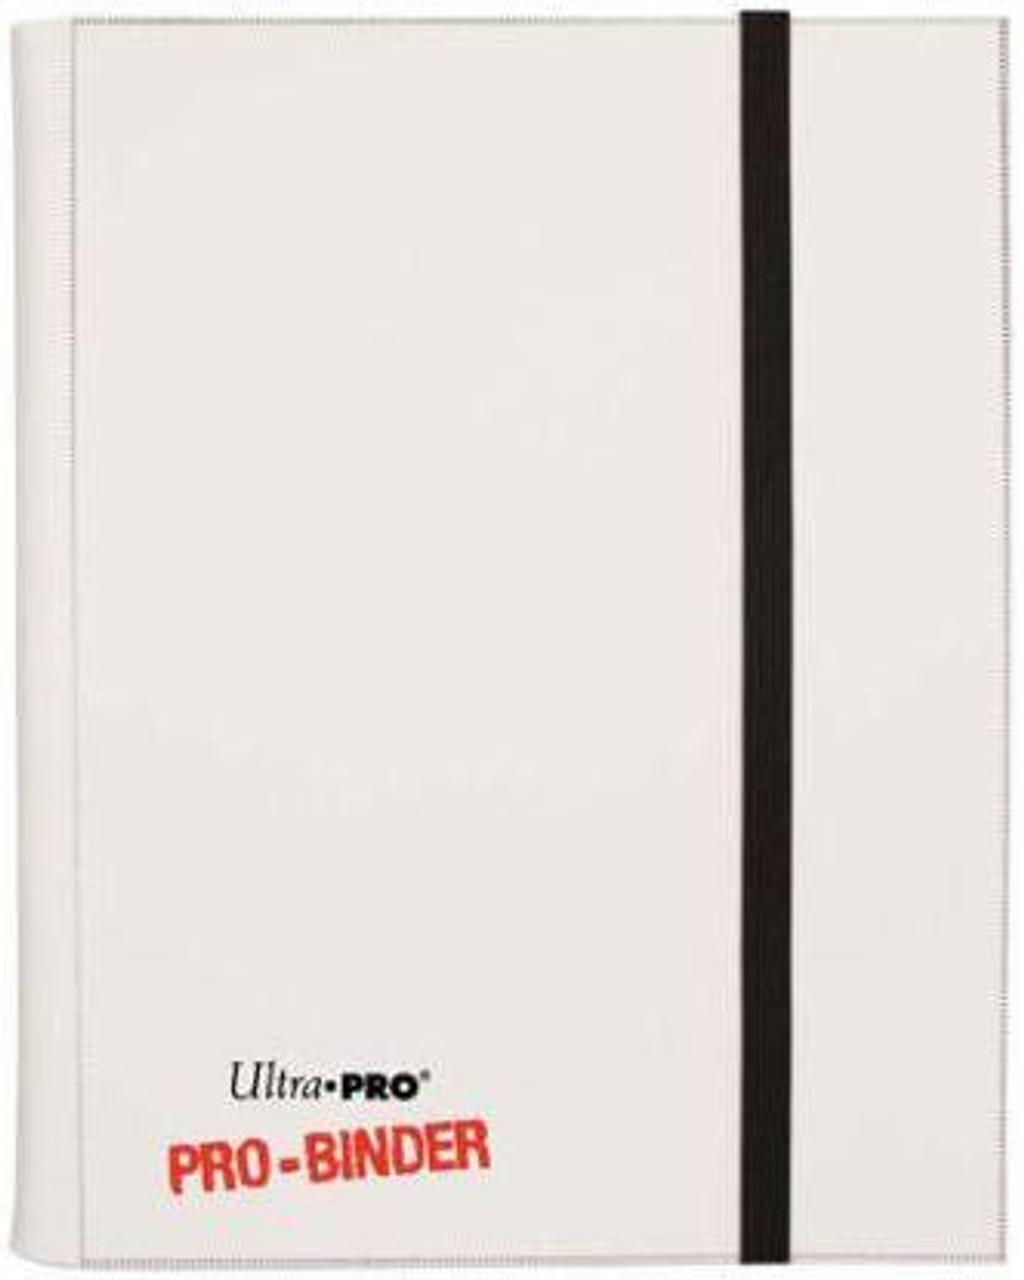 Ultra Pro Card Supplies Pro-Binder White 4-Pocket Binder